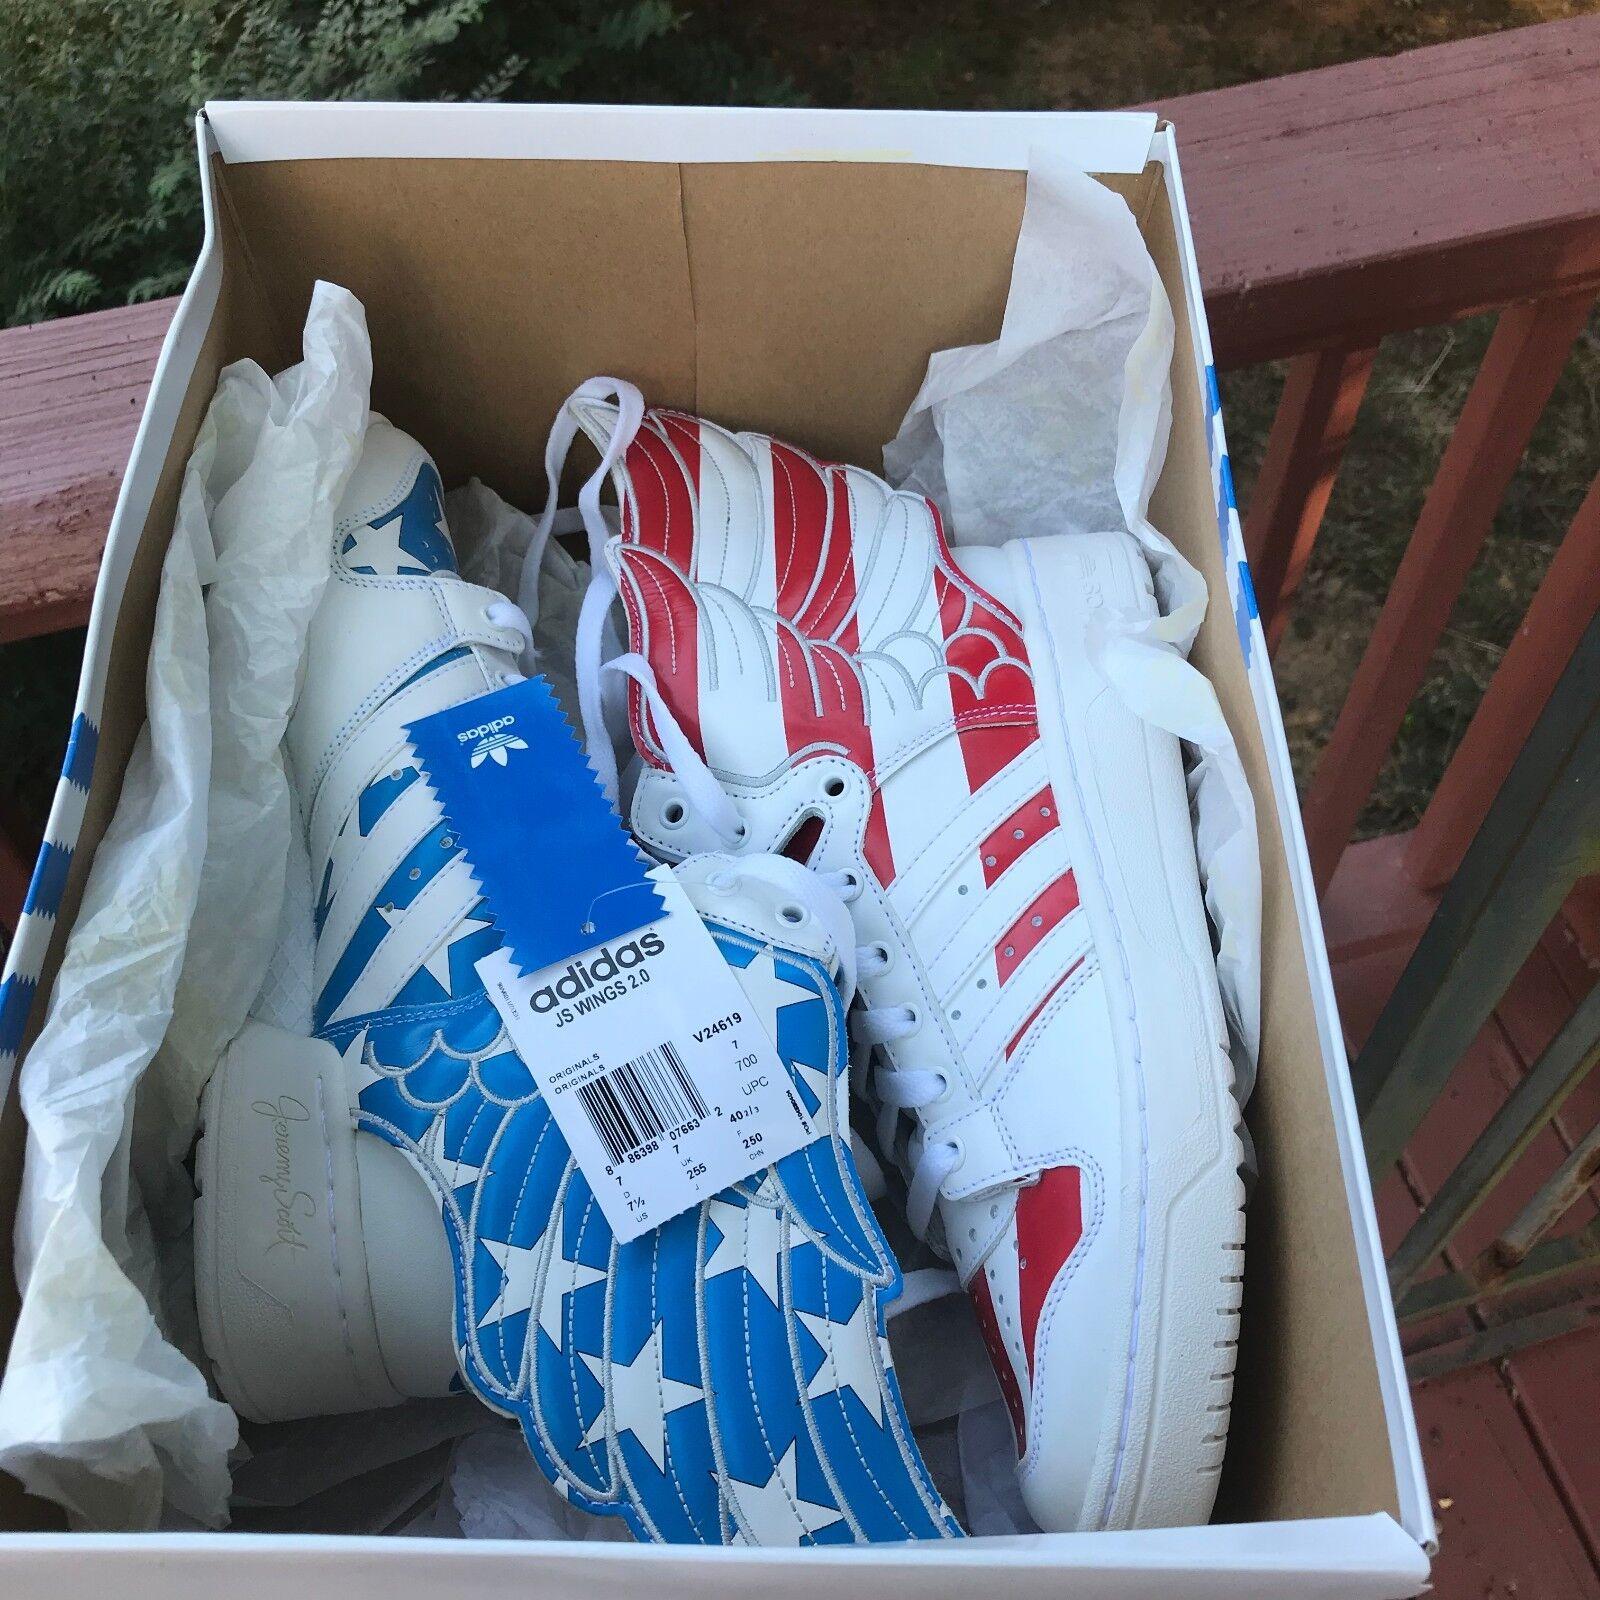 Auténtico tamaño 7.5 Adidas 2.0 Jeremy Scott Wings 2.0 Adidas US Flag Estrellas Y Tiras V24619 a127d4